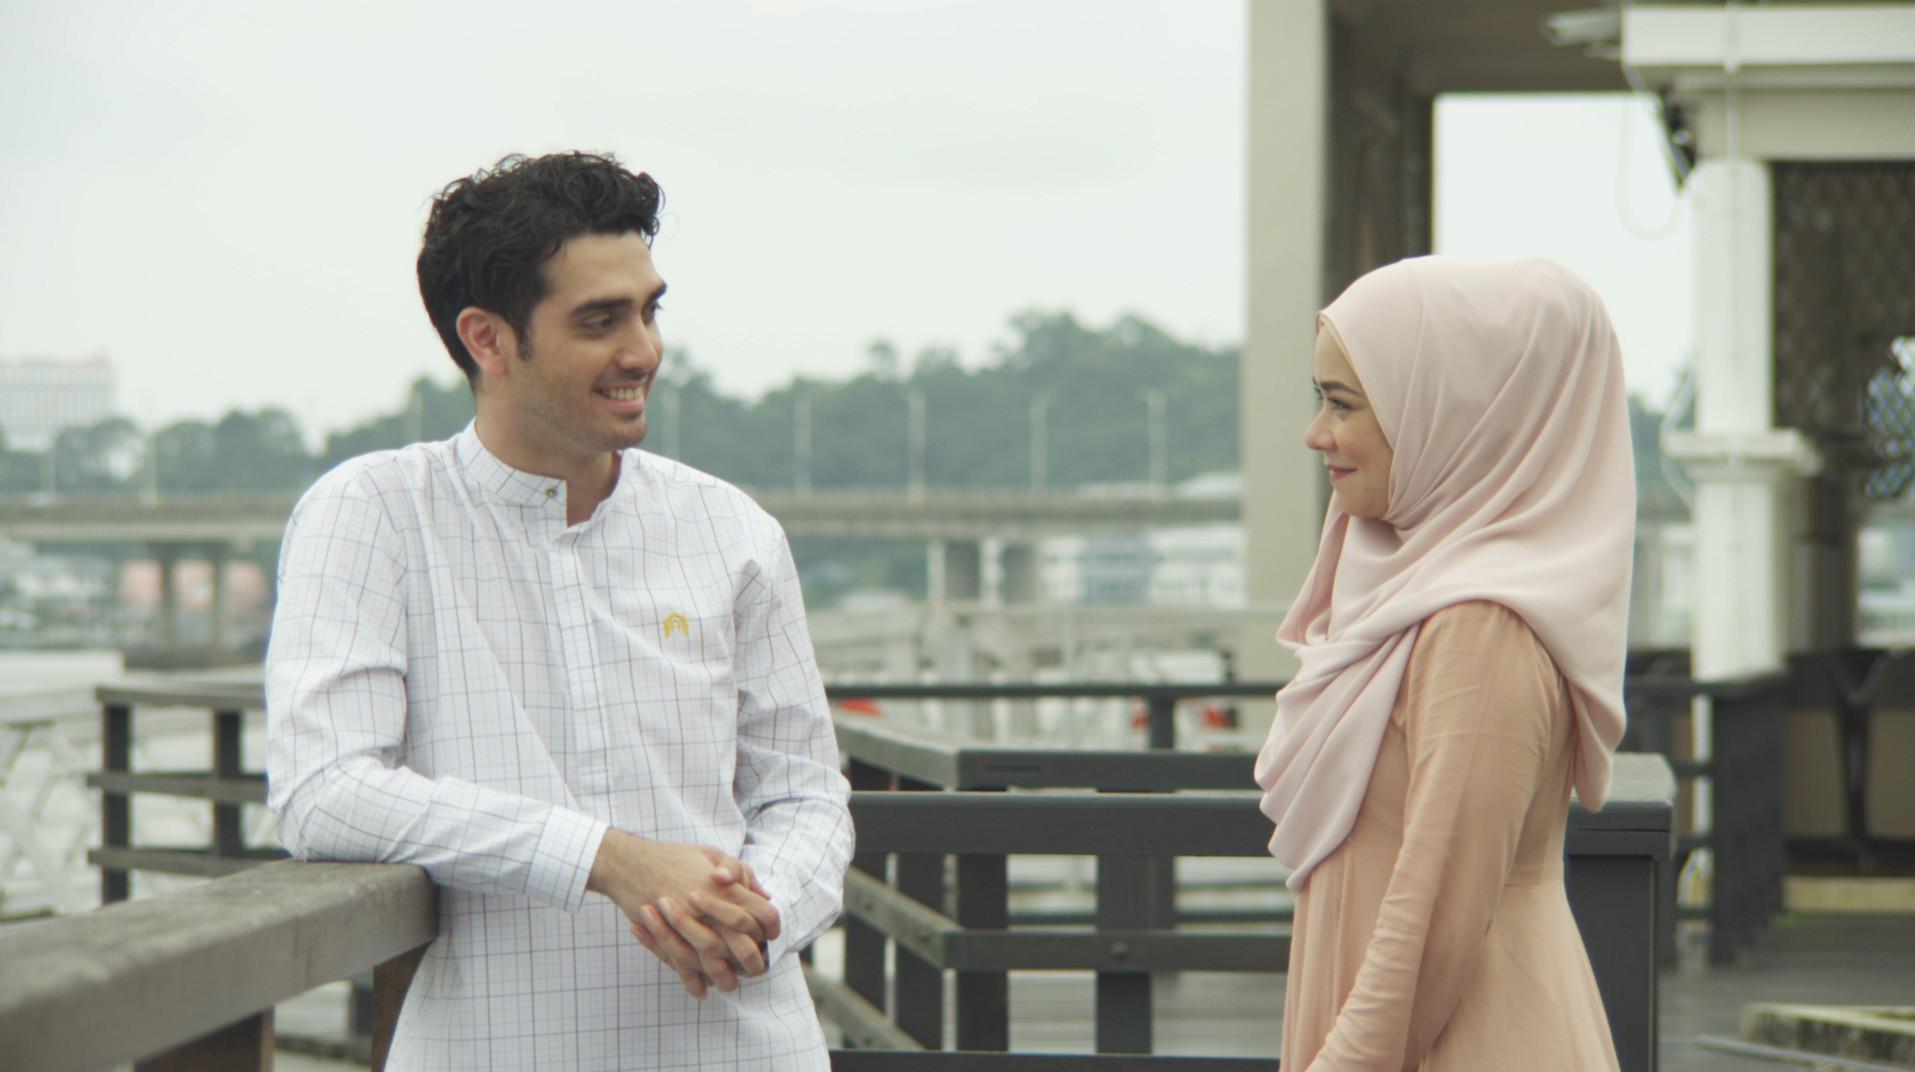 Fachri Albar, Donita, Dewi Irawan, dan bintang Malaysia, seperti Nora Danish dan Ashraf Muslim beradu akting di Bukan Cinta Malaikat. (Foto: Istimewa)